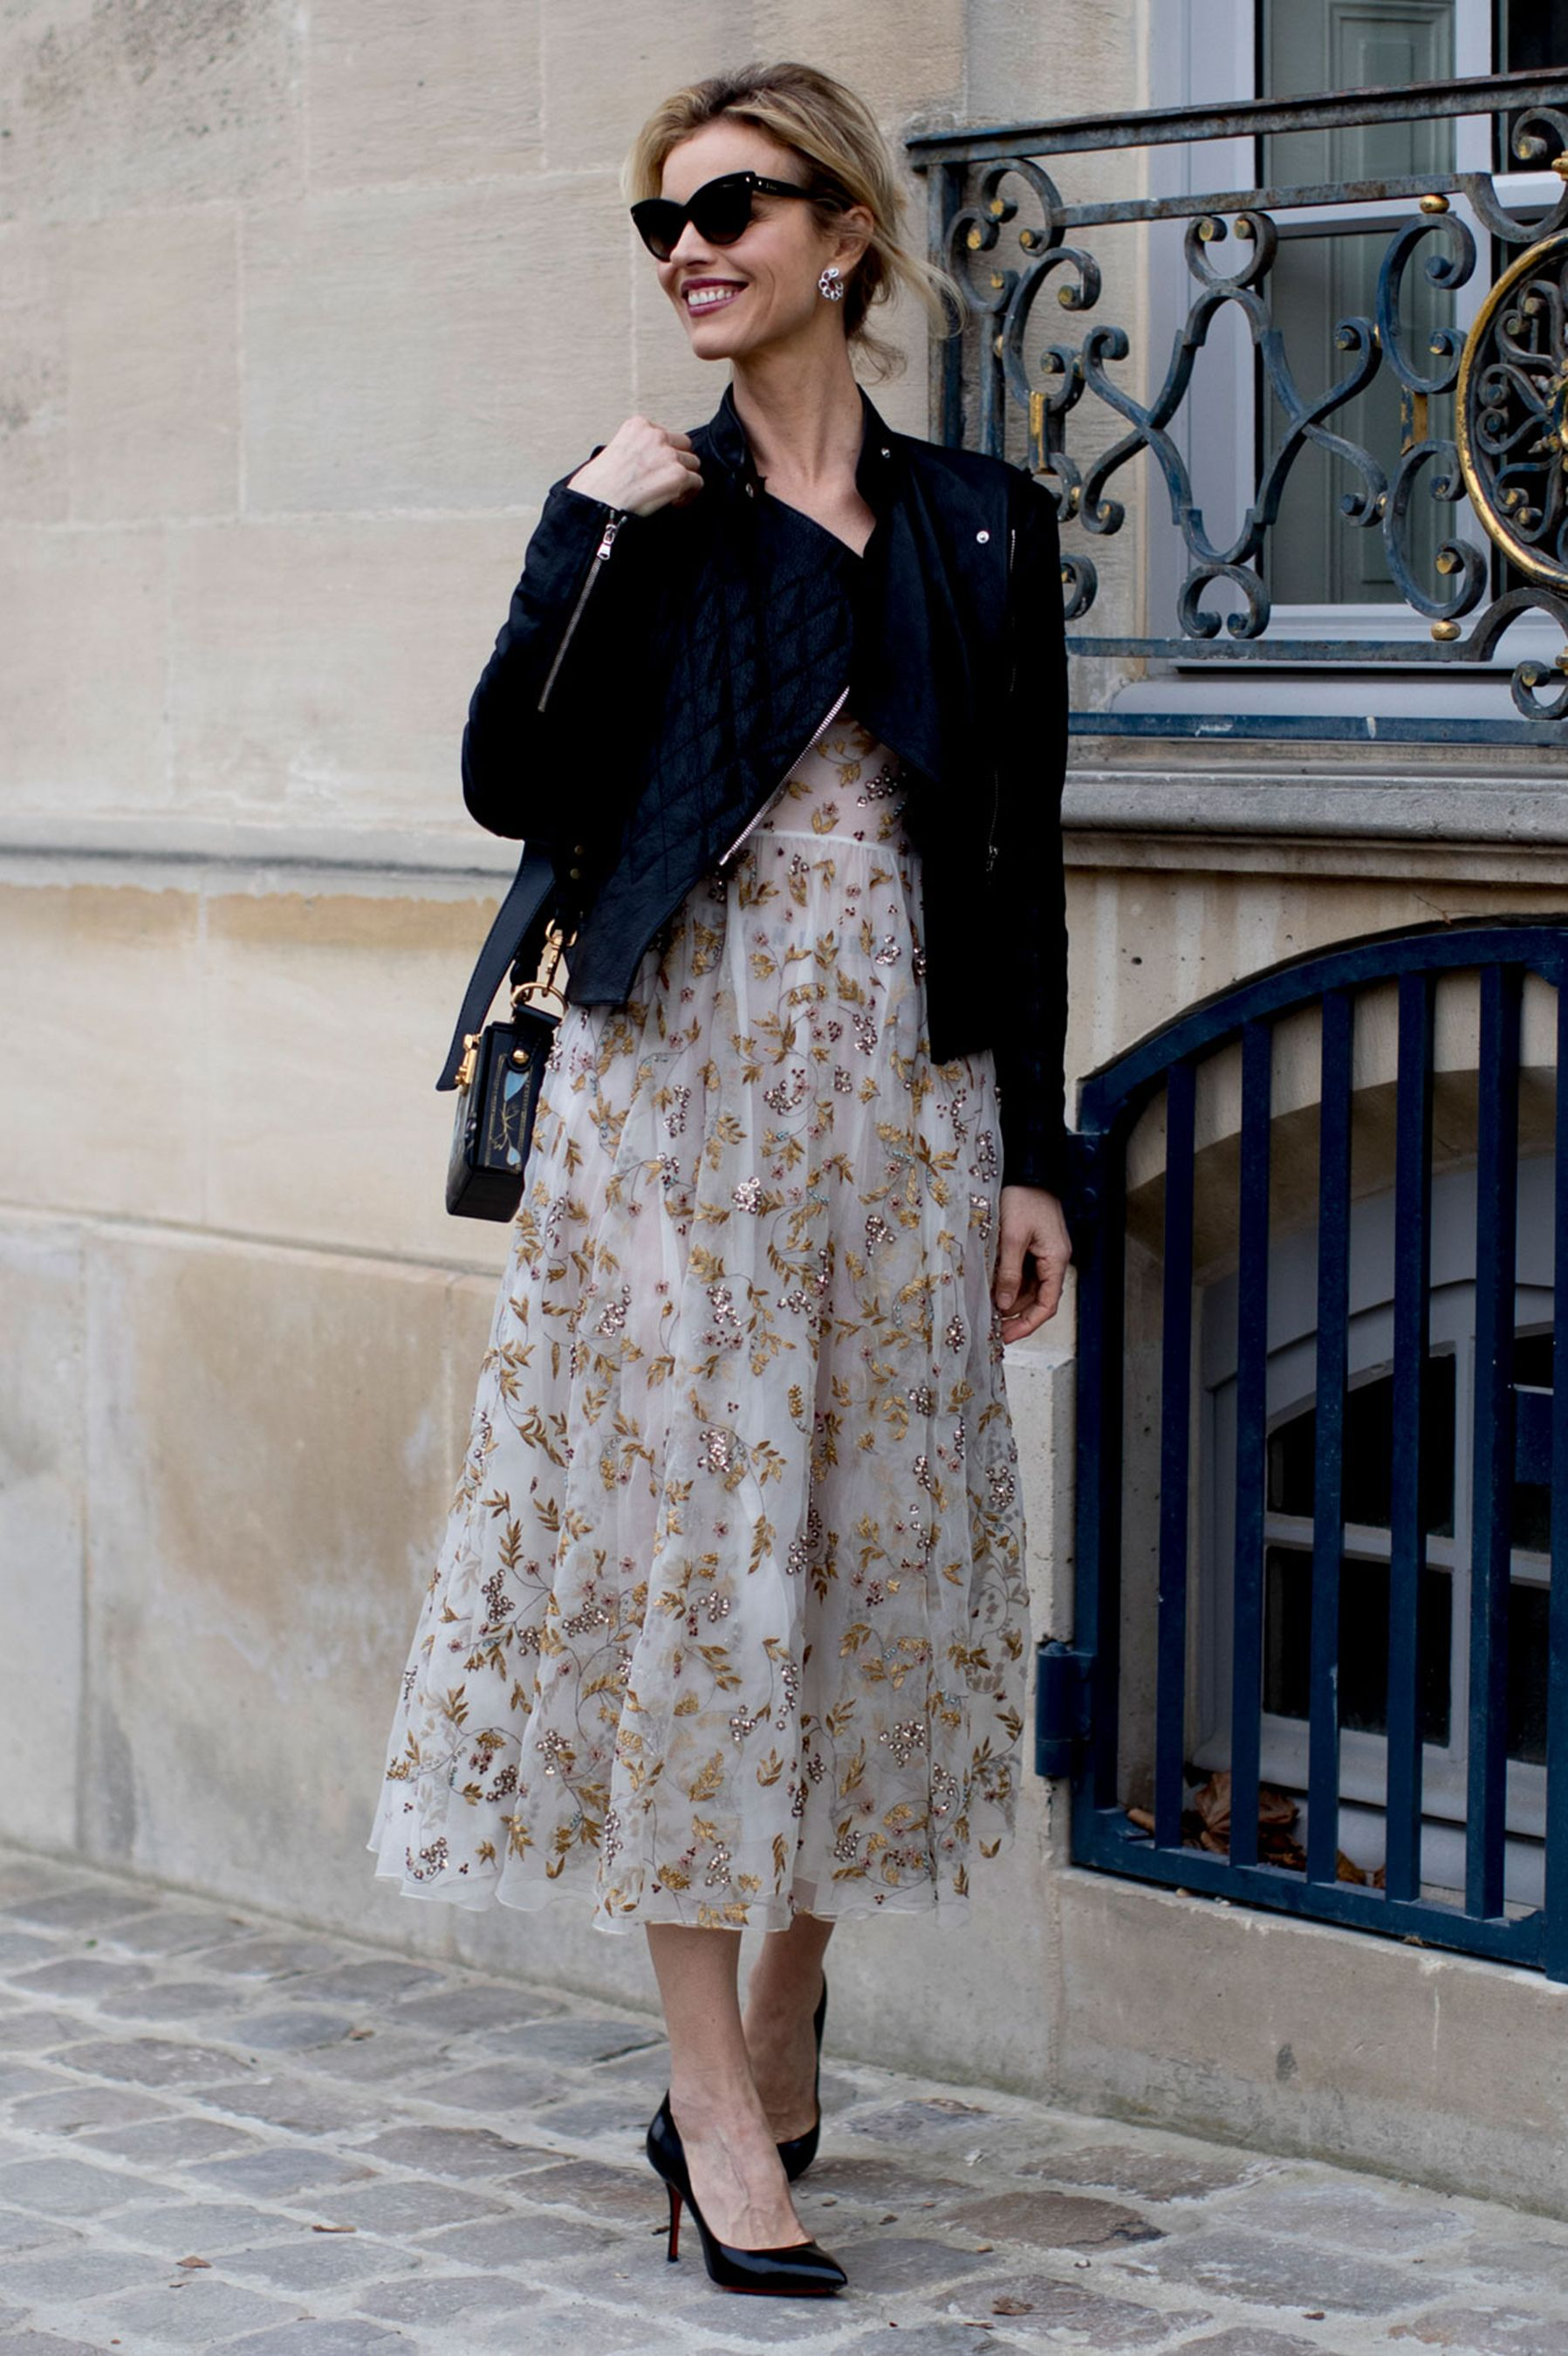 1d5095f27fb7 The Best Street Style At Paris Fashion Week Autumn Winter 2017 ...